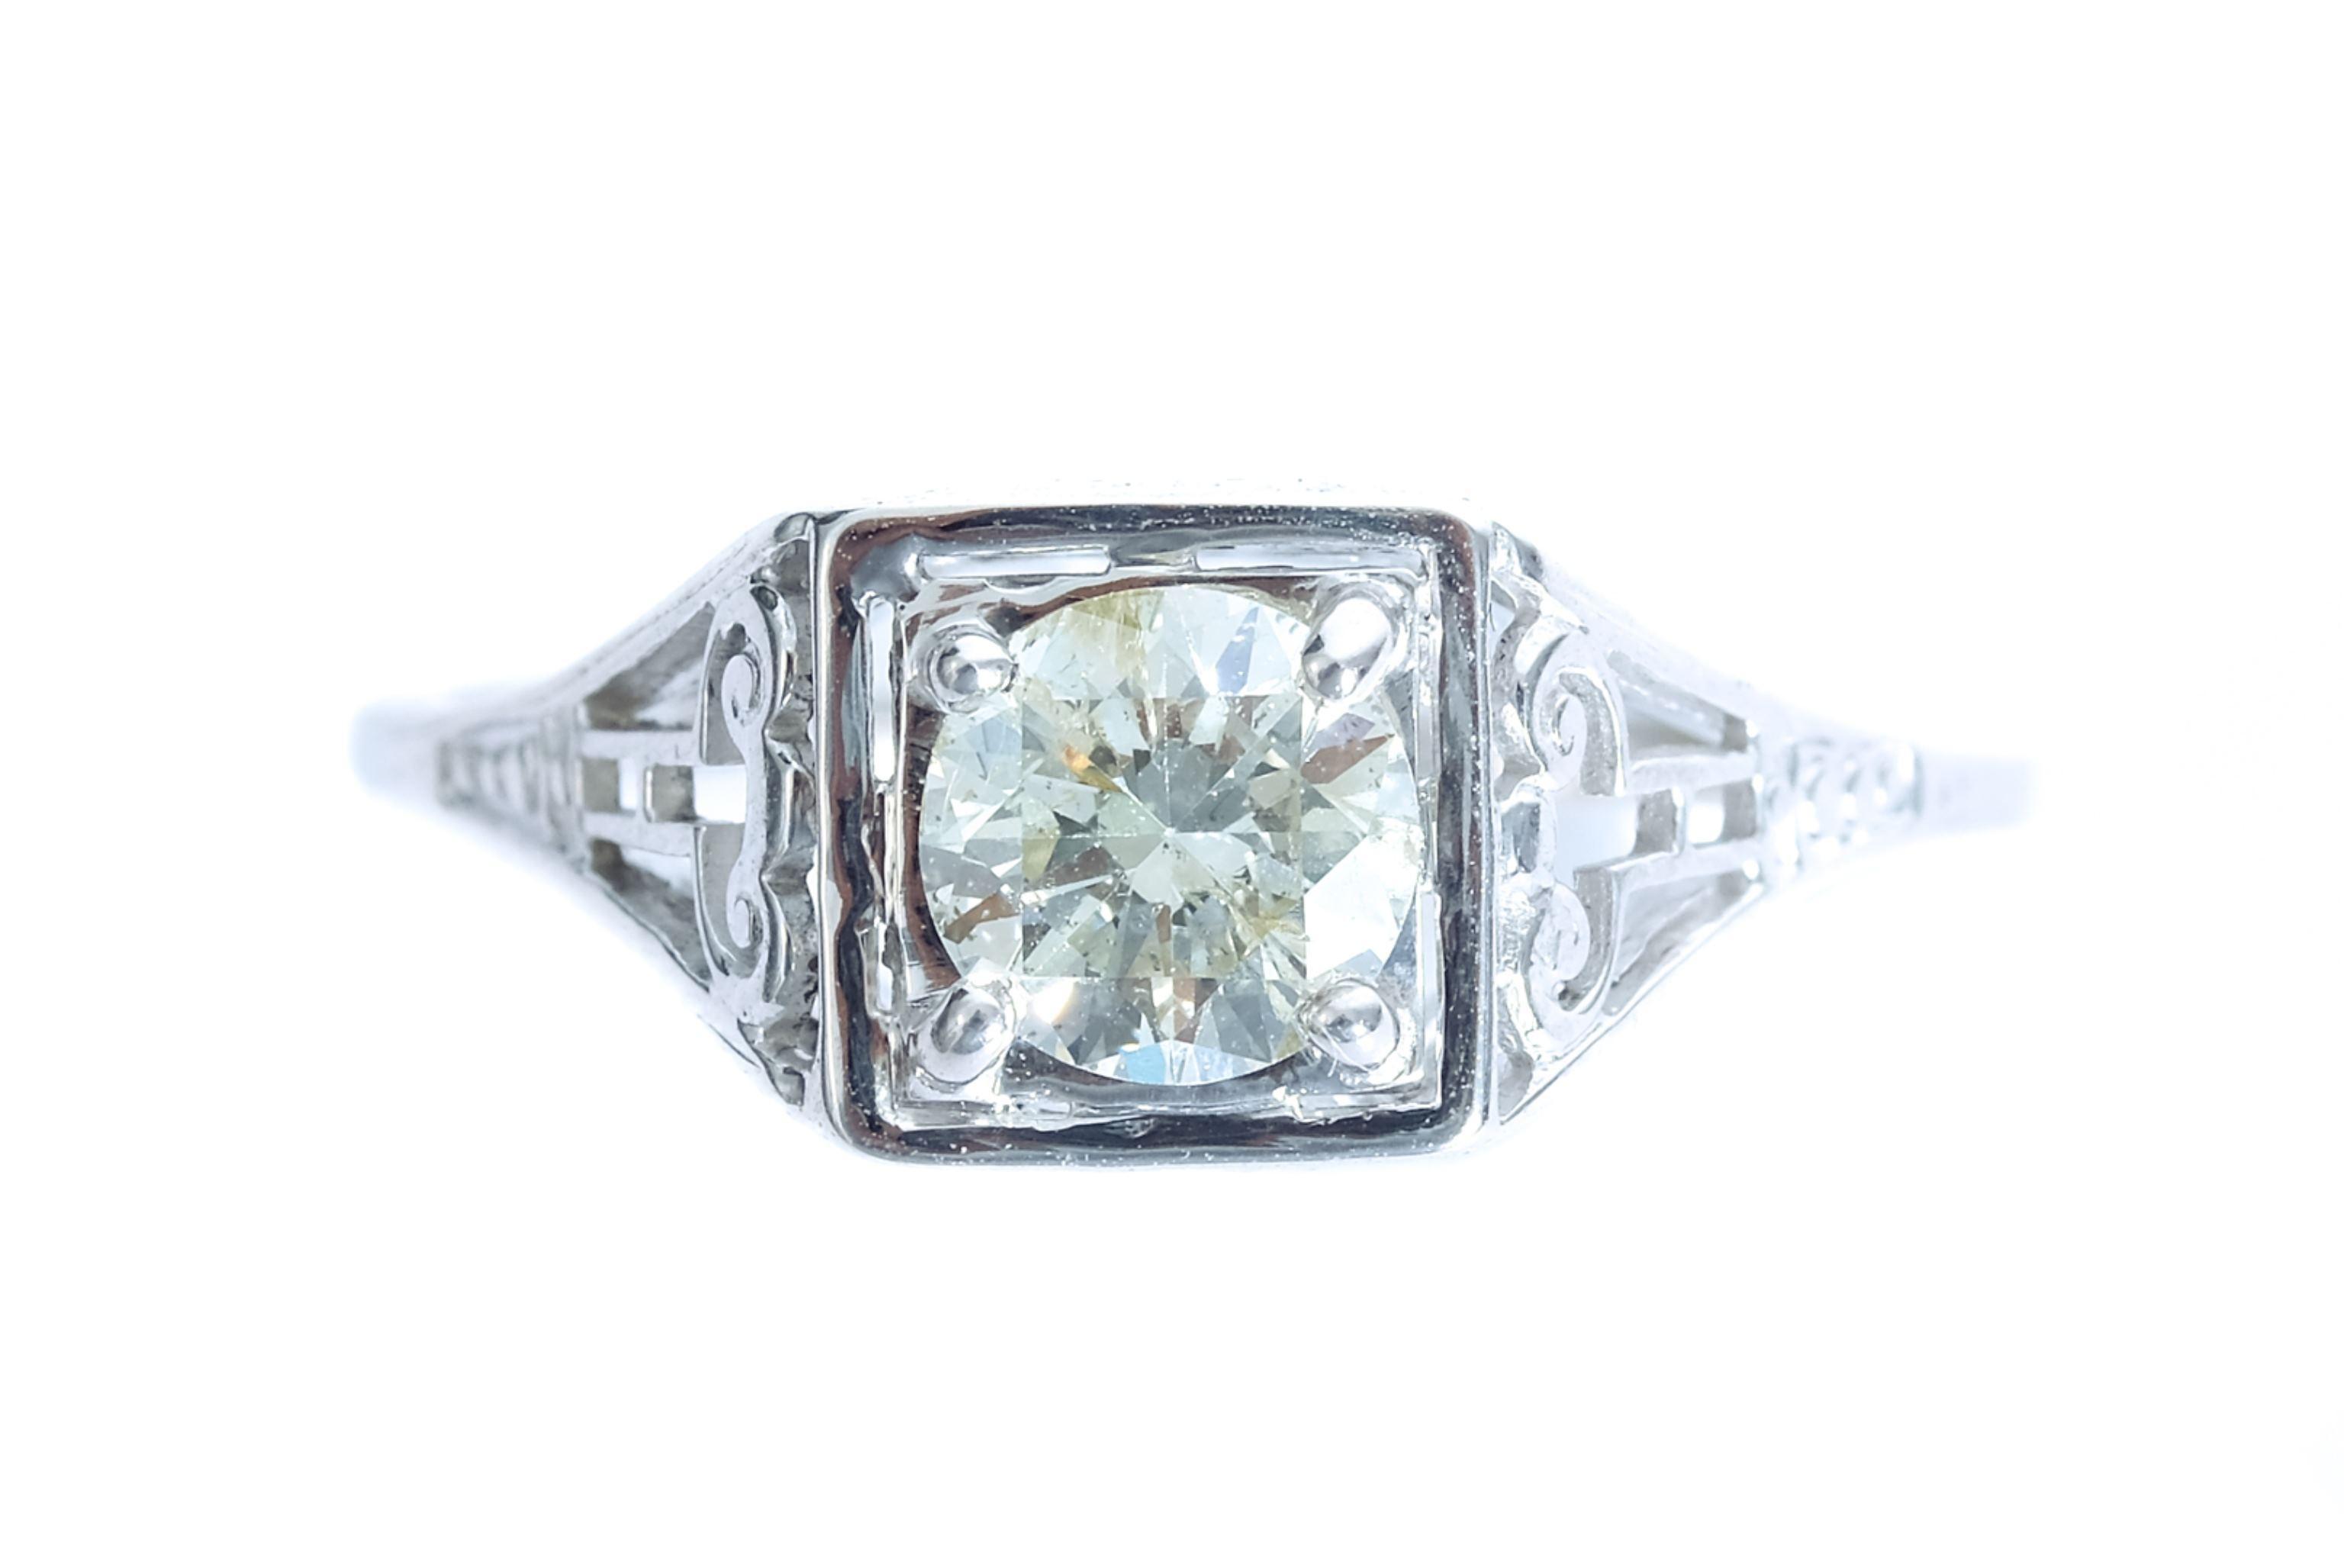 14k White Gold & Diamond Filigree Ring, size 6